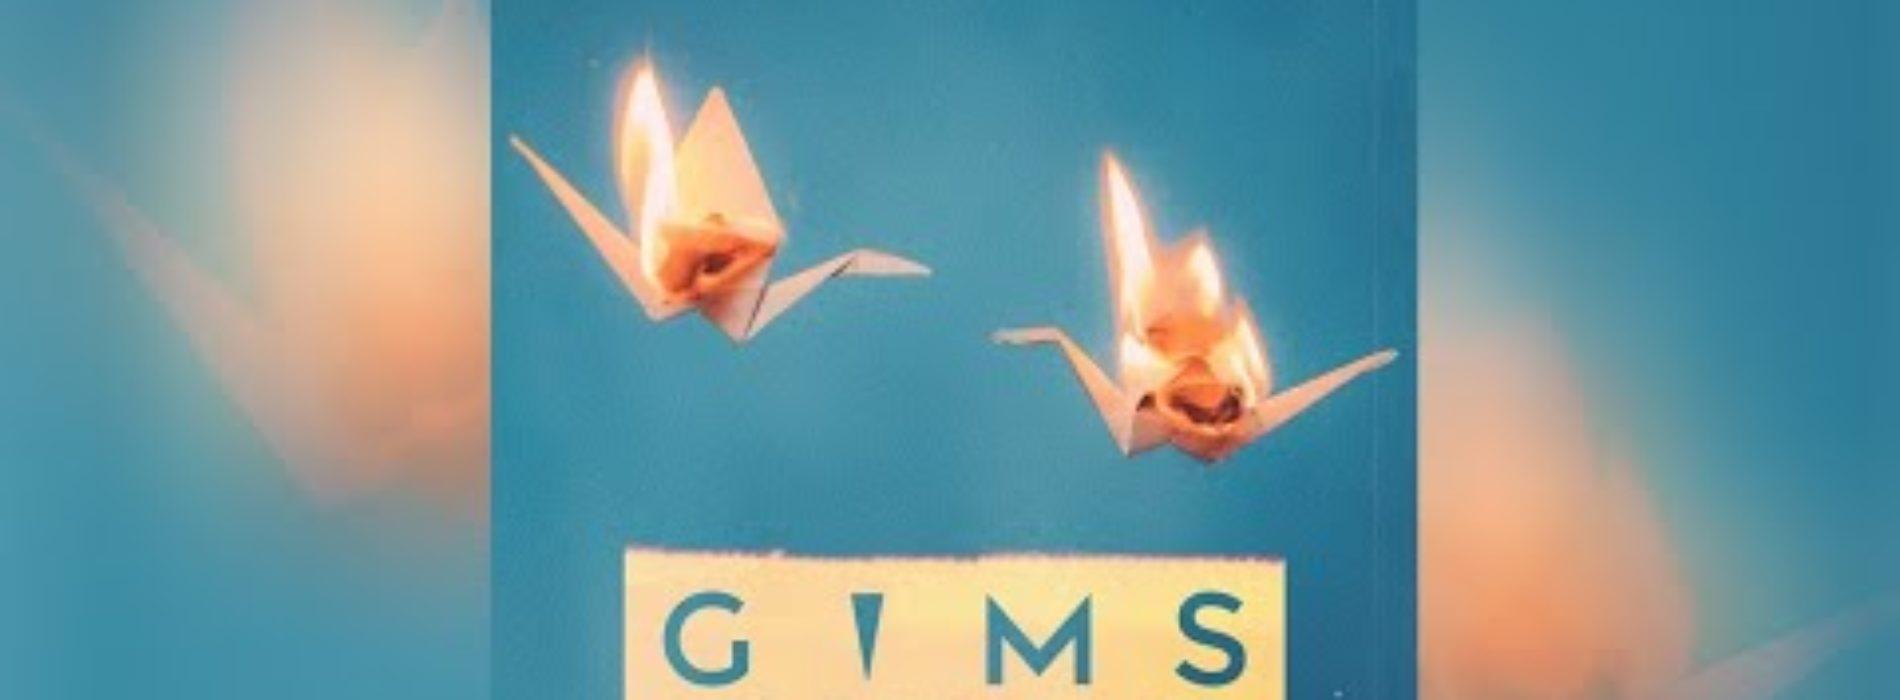 GIMS – ORIGAMI (Audio Officiel) – Octobre 2020